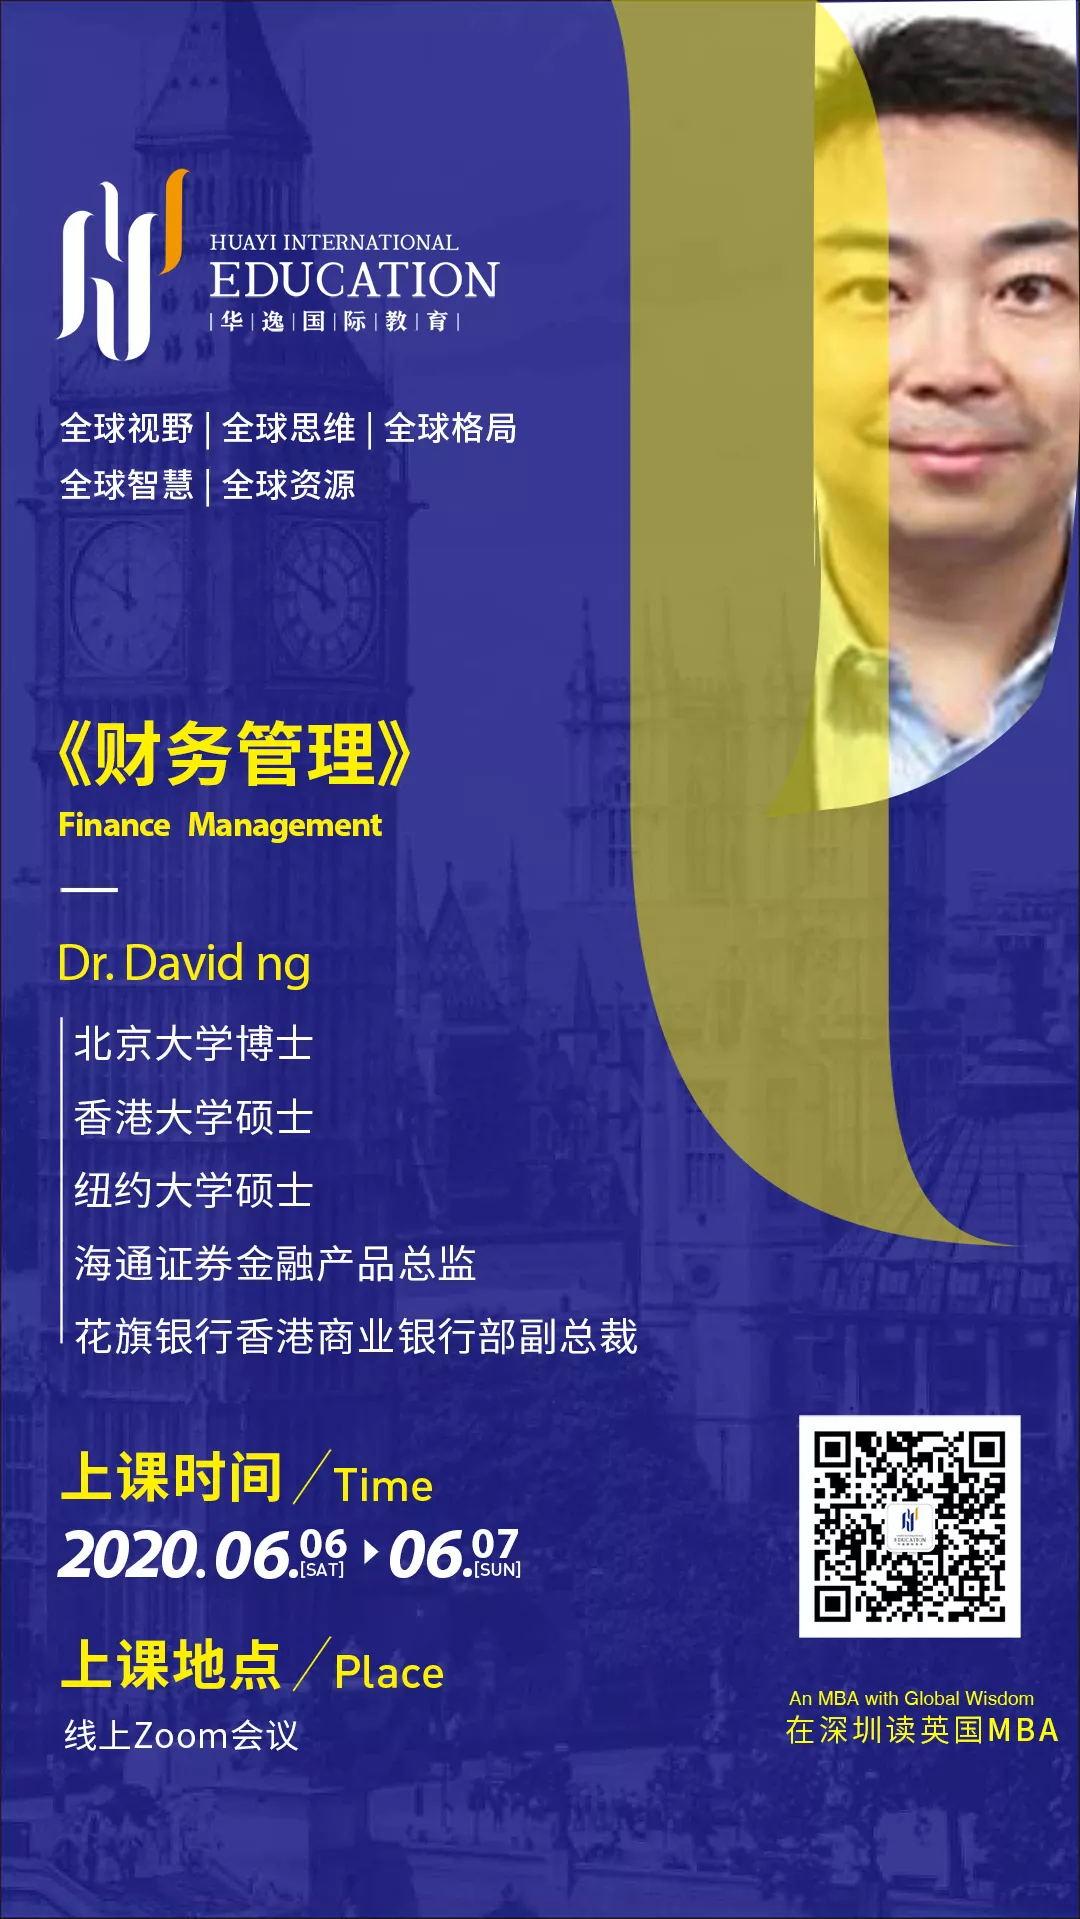 fd27dd0efa29f51aa62085050f2c2c31-sz_975183_看图王.web